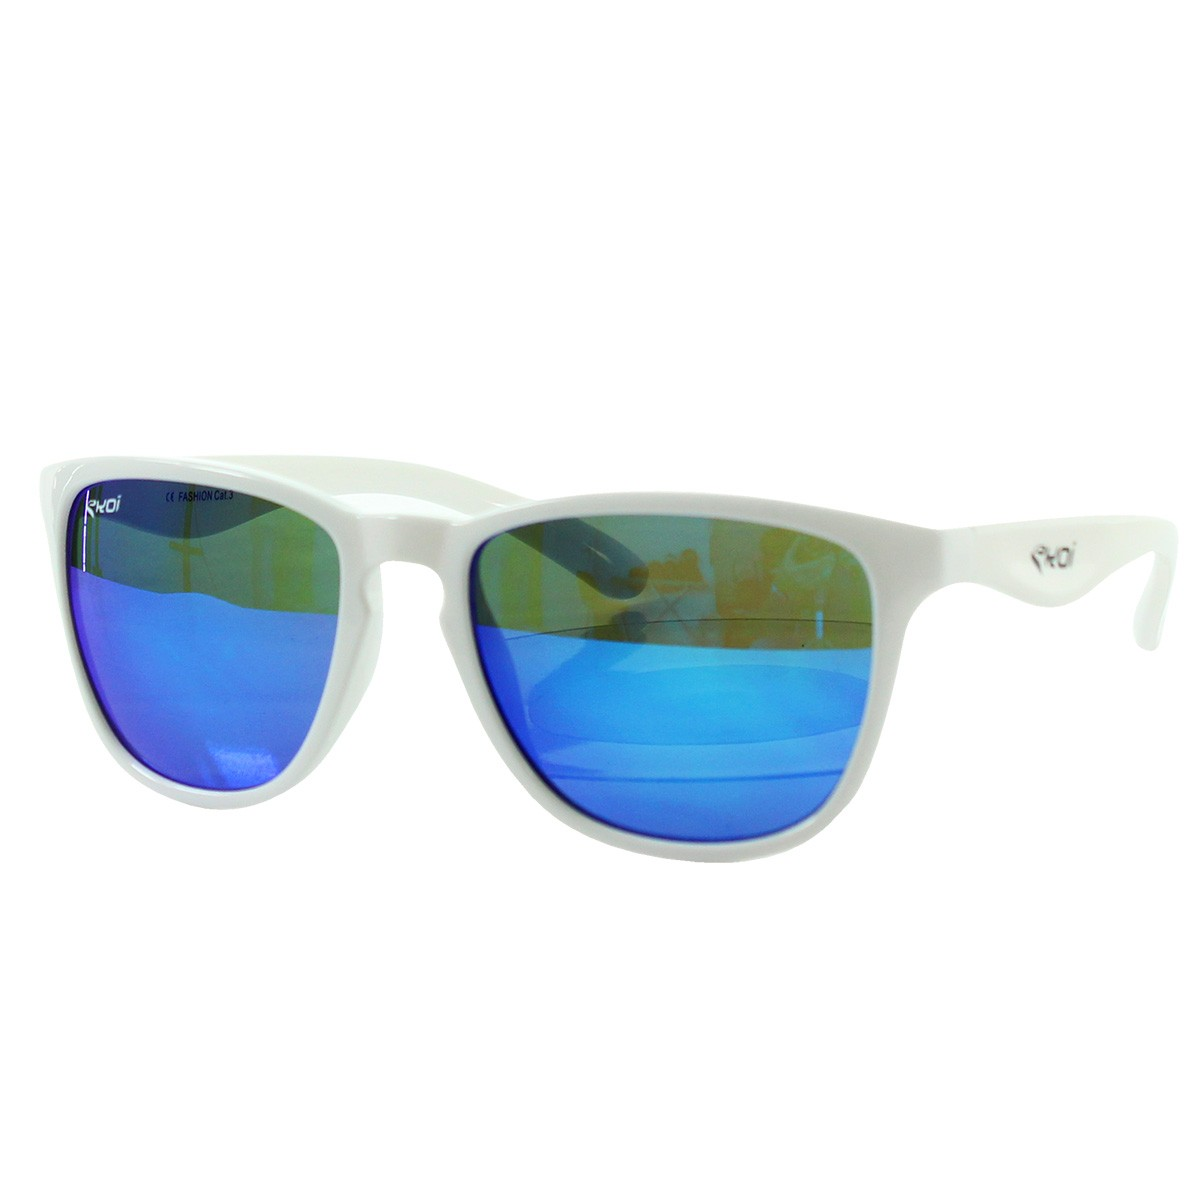 Blanc bleu clothing online